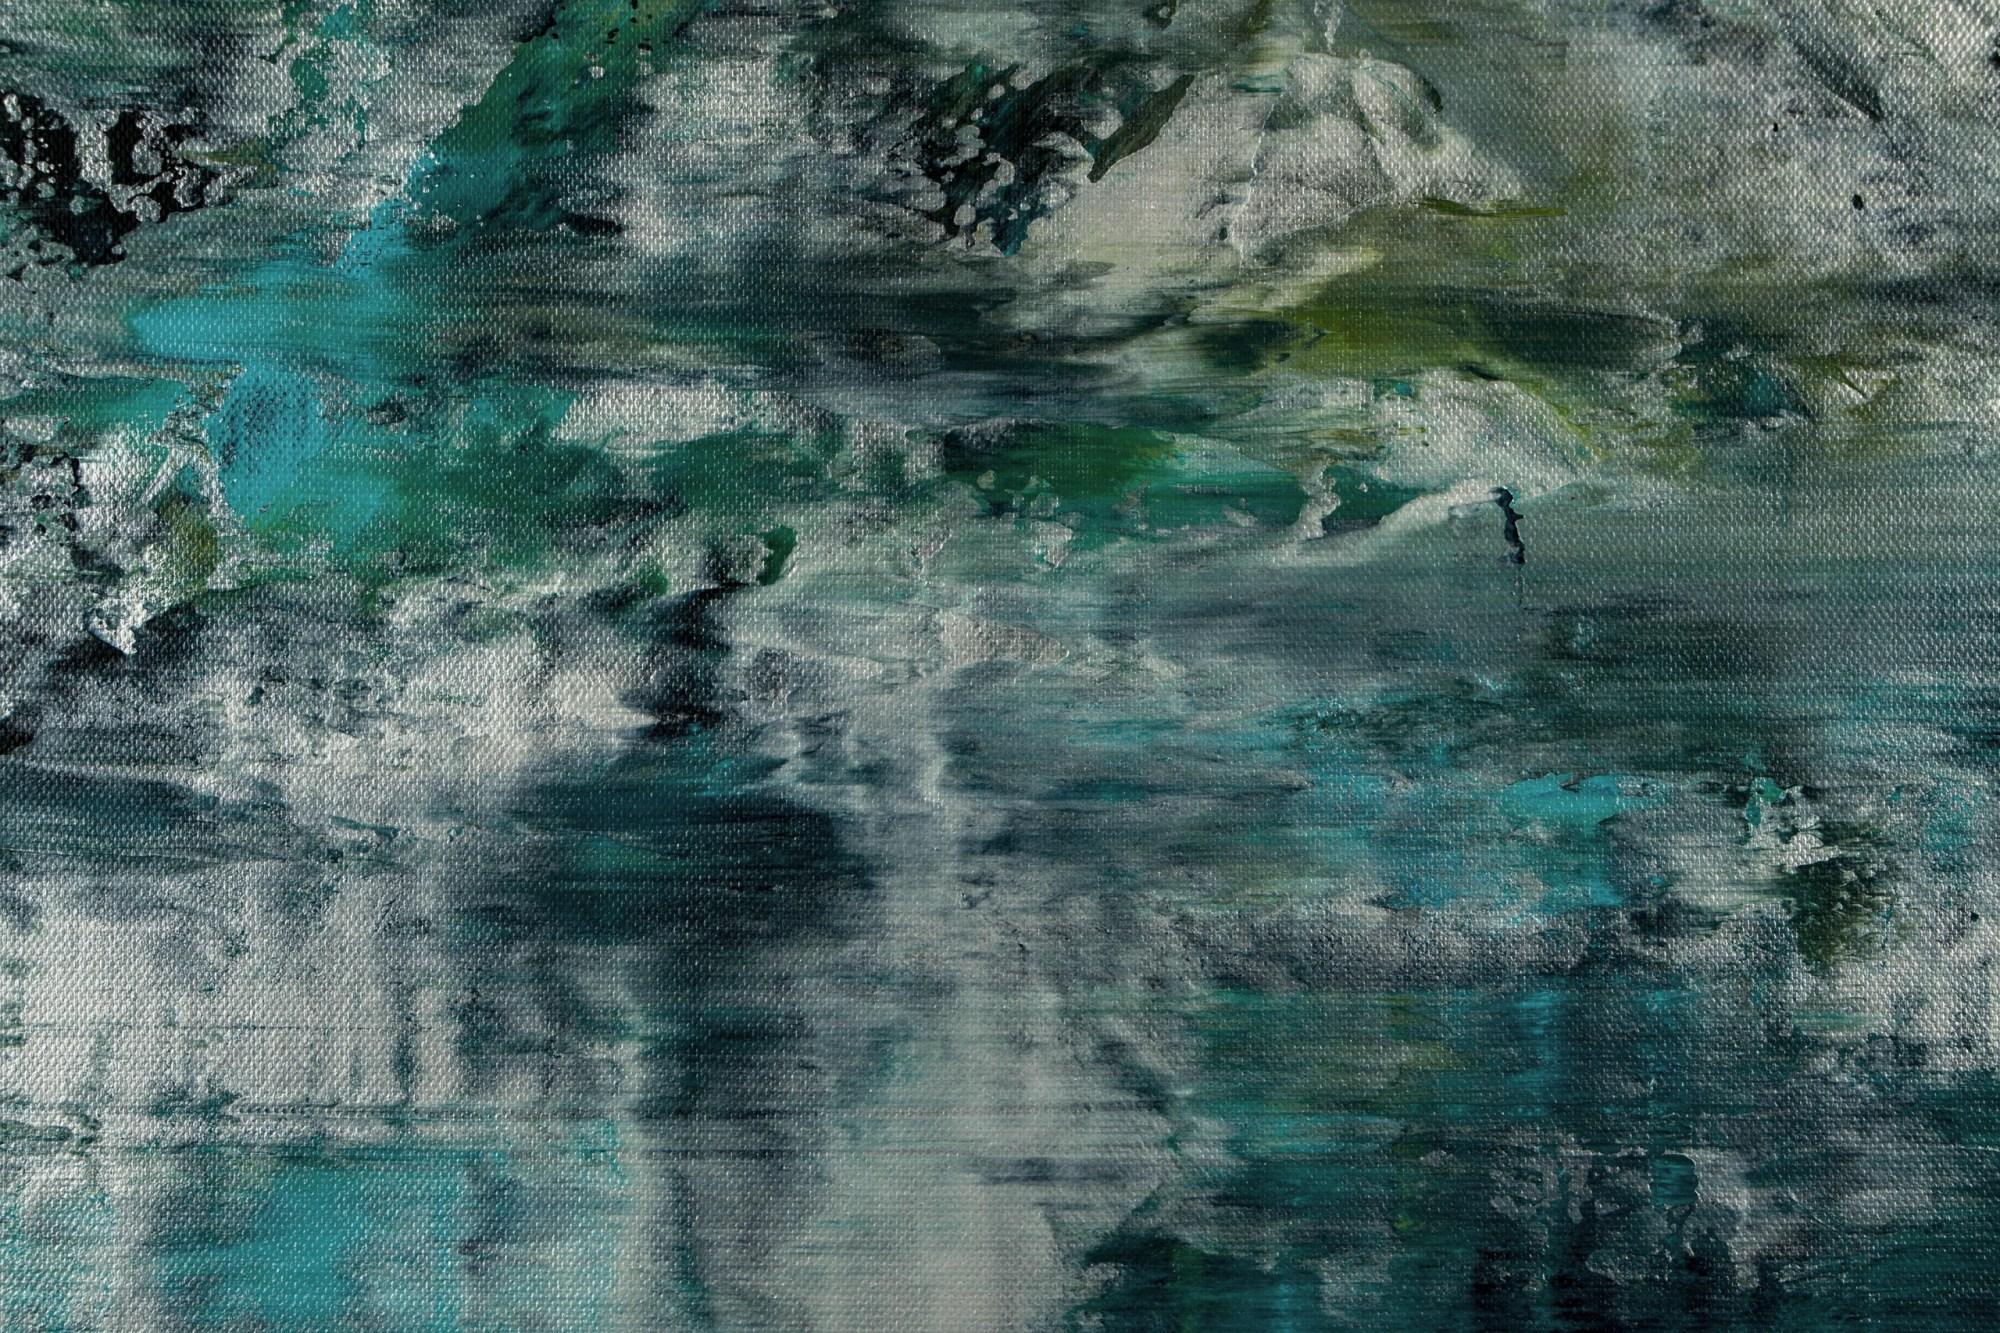 Detail / Waterflow (Night Clouds) / (2021) / Artist - Nestor Toro